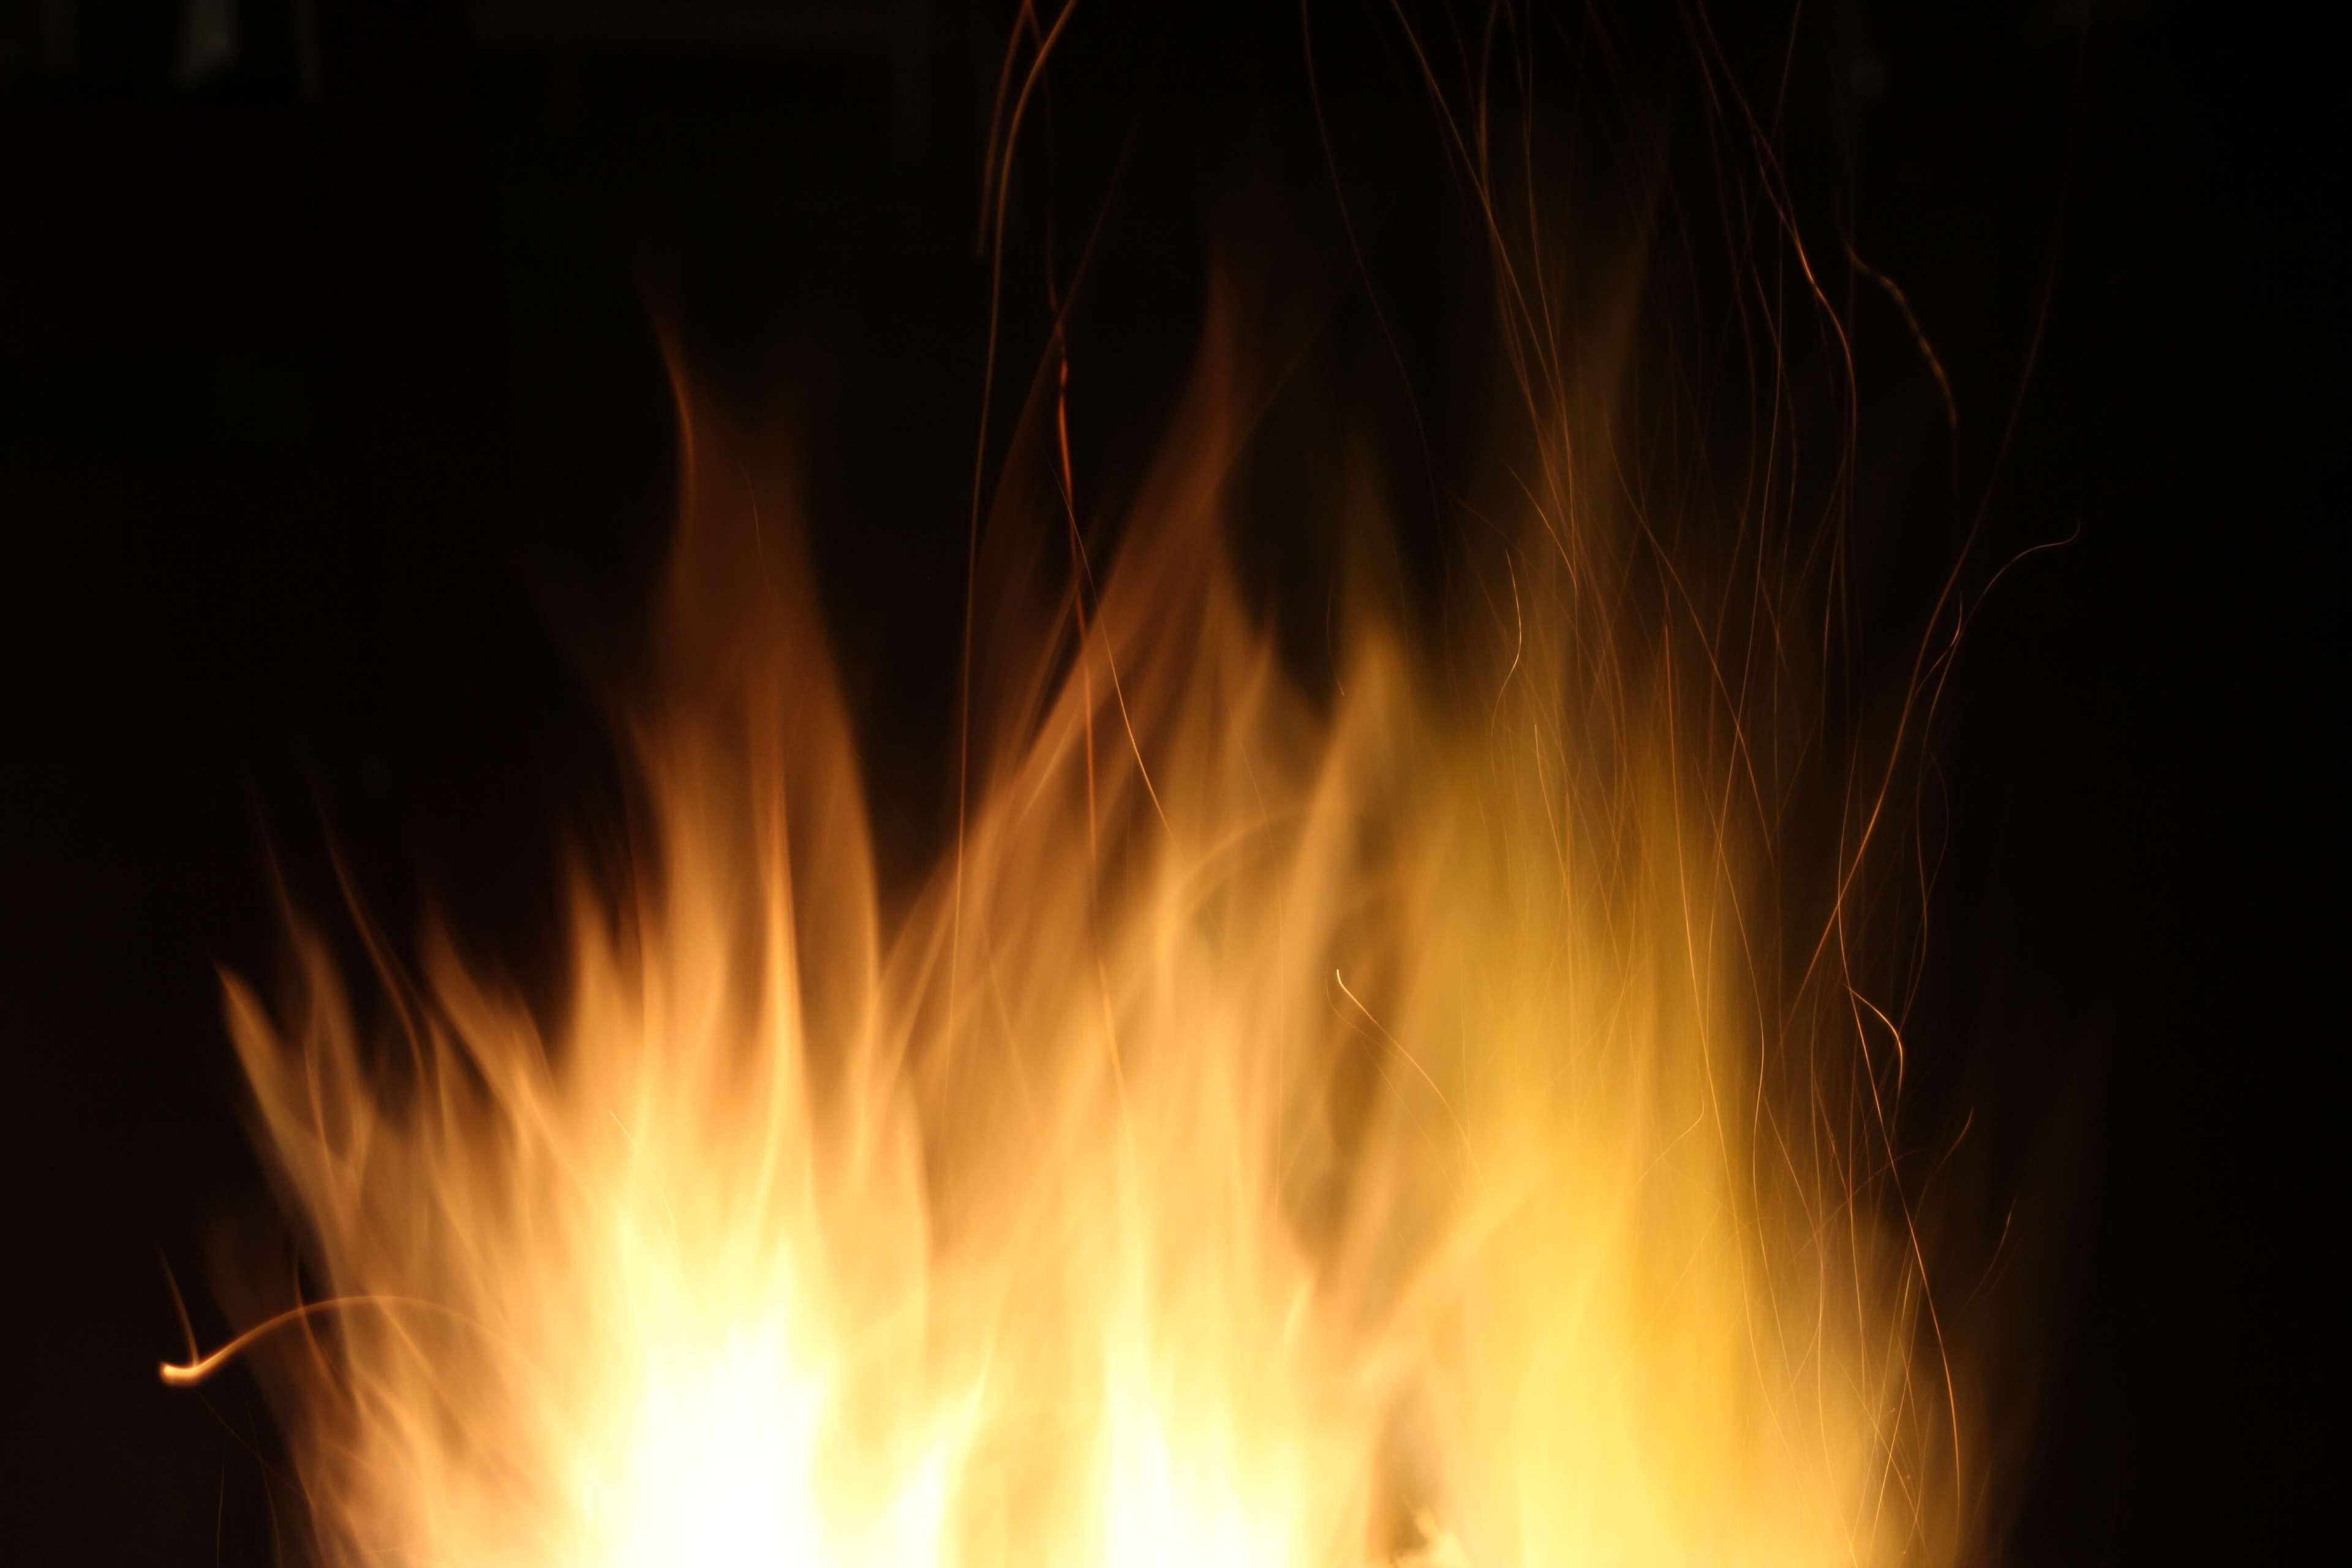 closeup dark fire fire pit flame flames heat night yellow